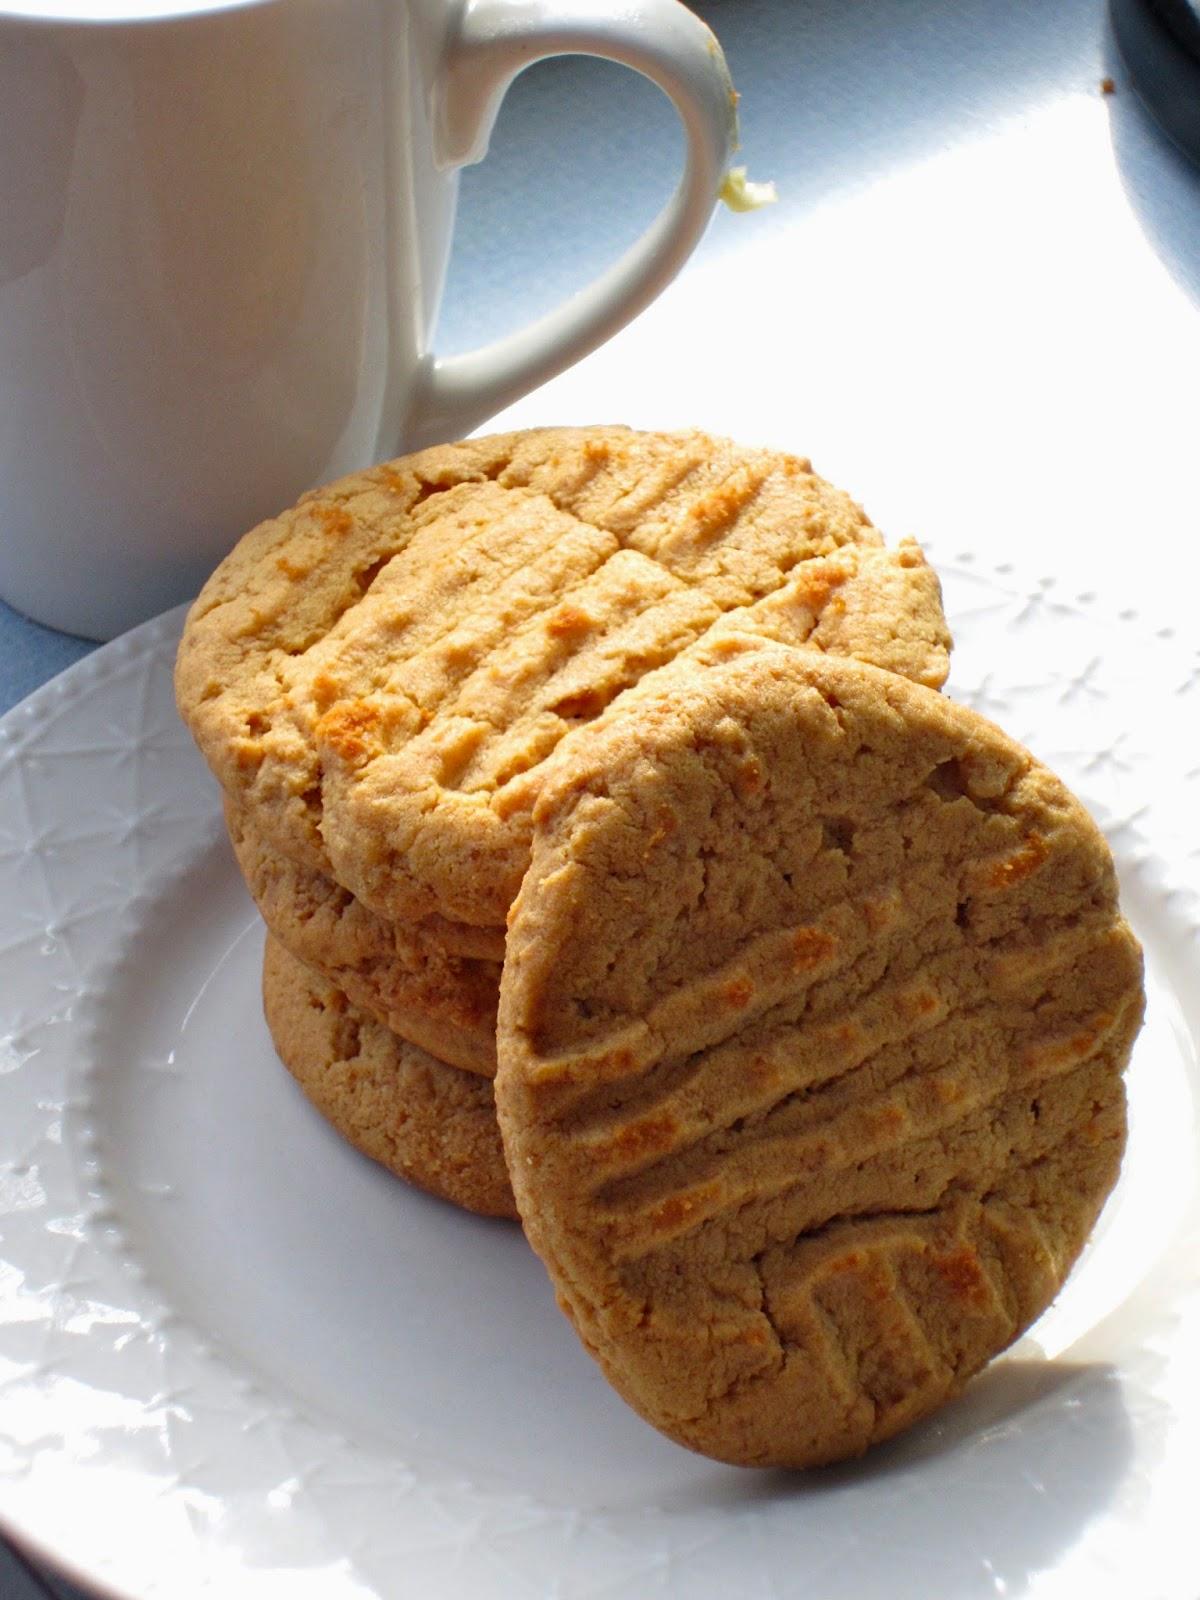 Martha Stewart's Peanut Butter Cookies